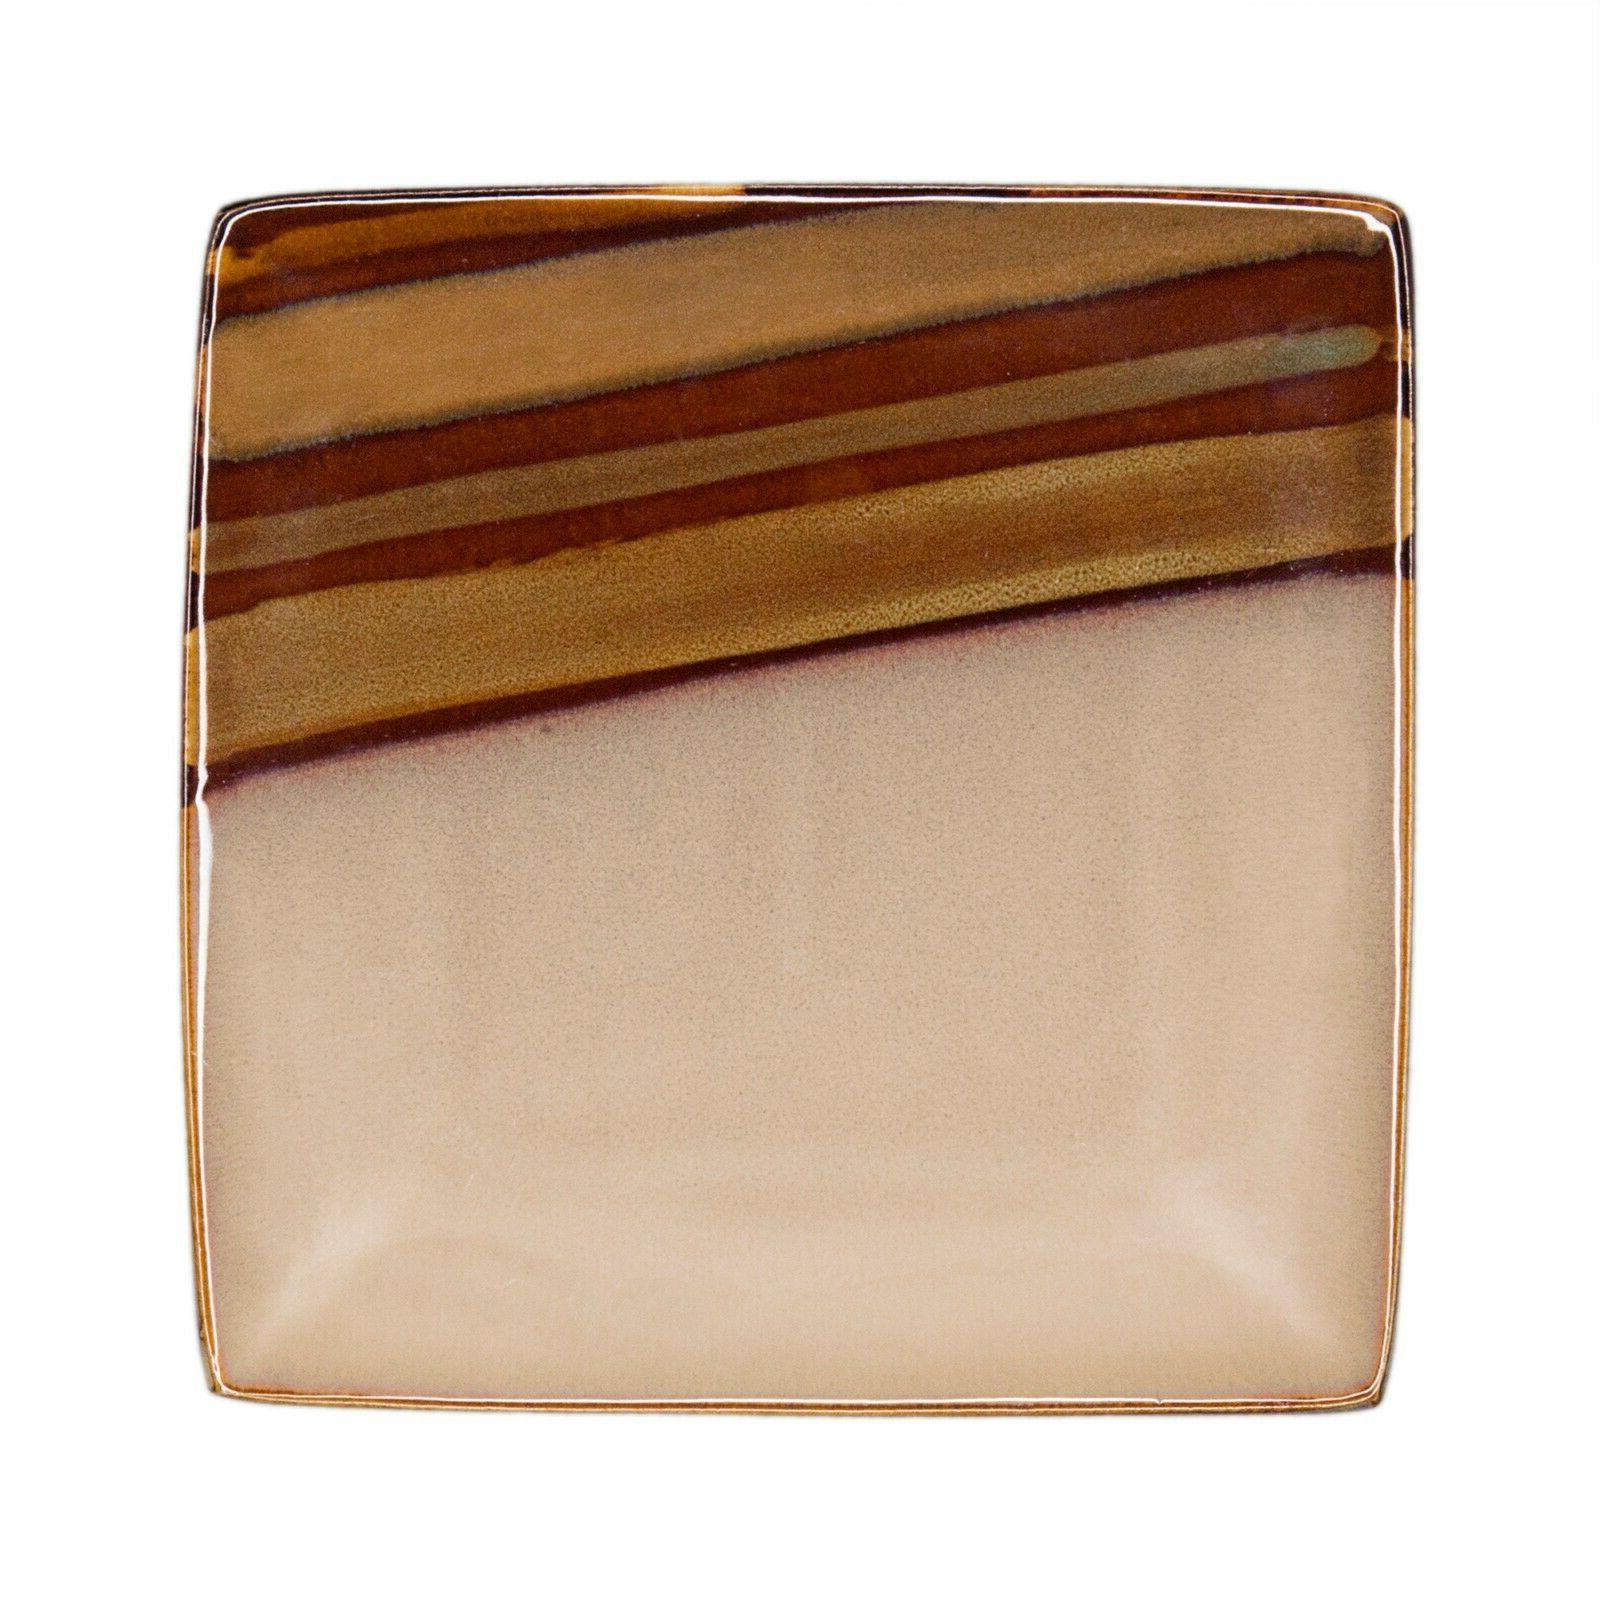 Sango Brown Piece Reactive Glaze Dinnerware Set